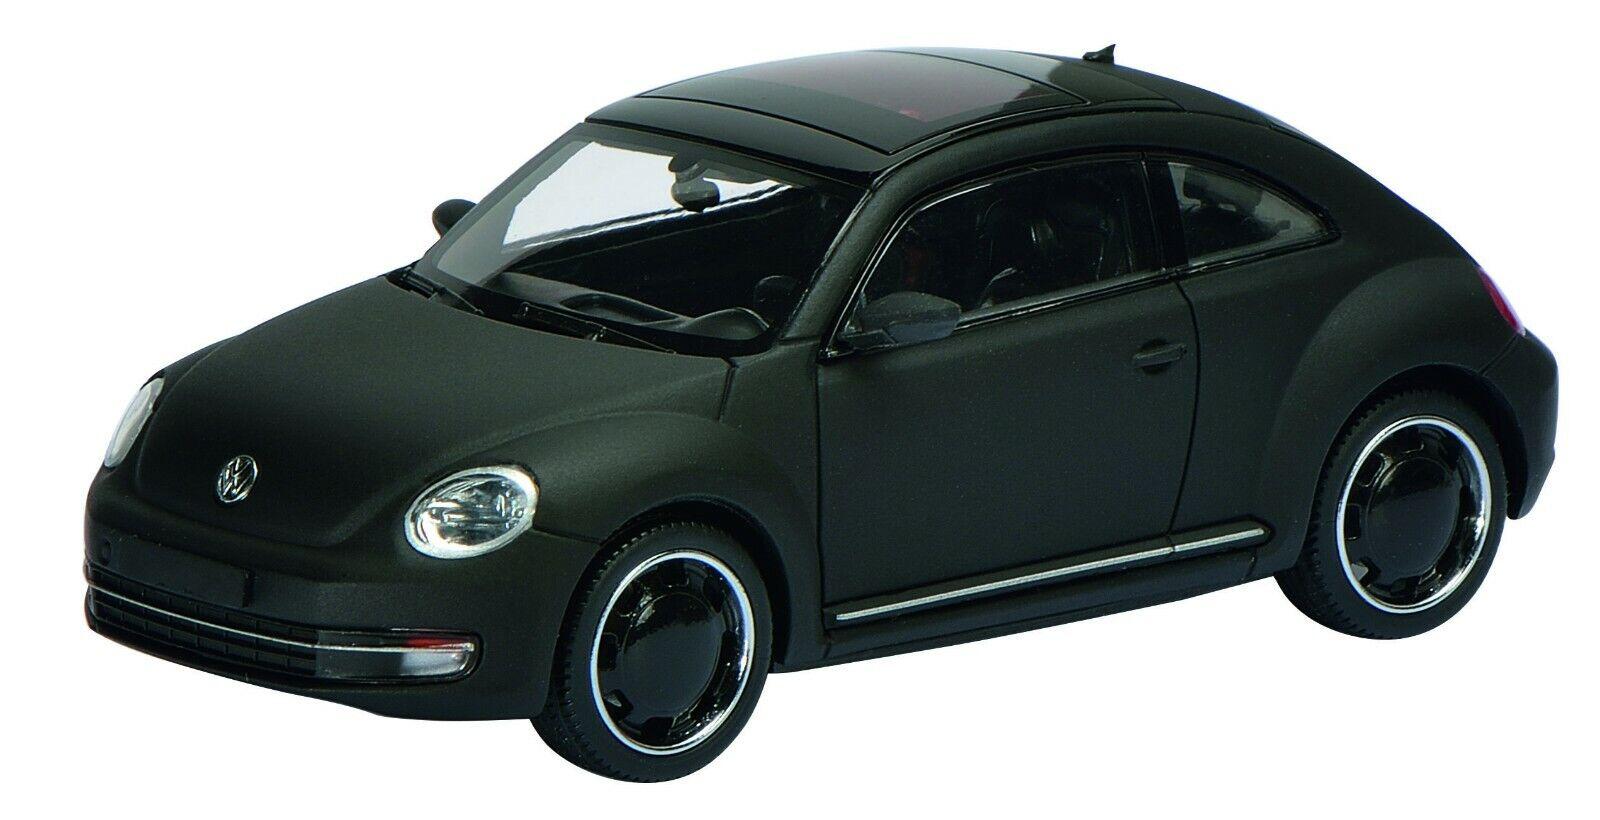 Schuco 07473 VW Beetle   Concept Car - Sealed 1 of 1000 Pieces 1 43